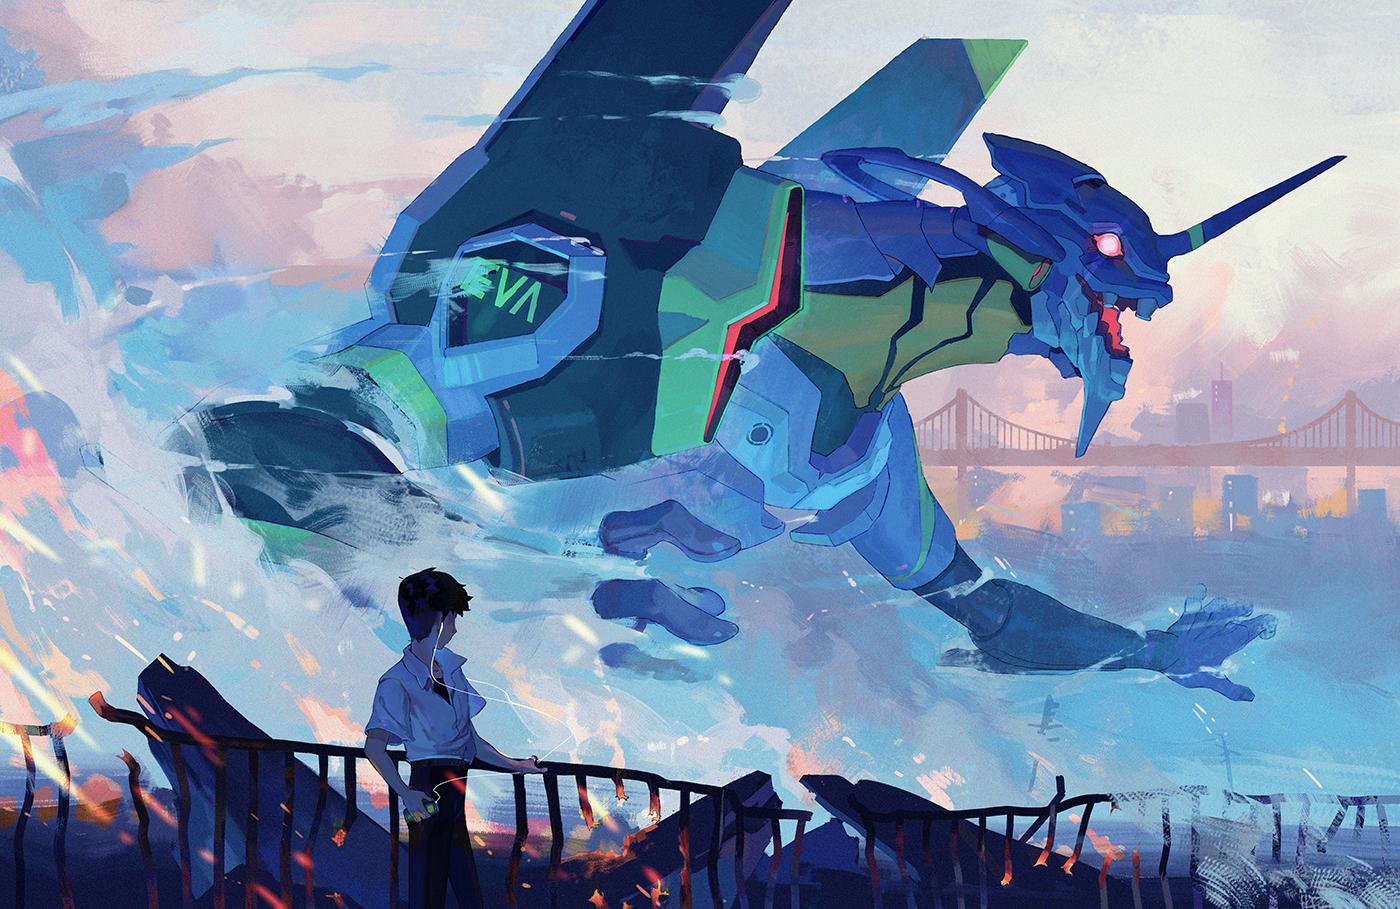 Wallpaper Neon Genesis Evangelion Mech Eva Unit 01